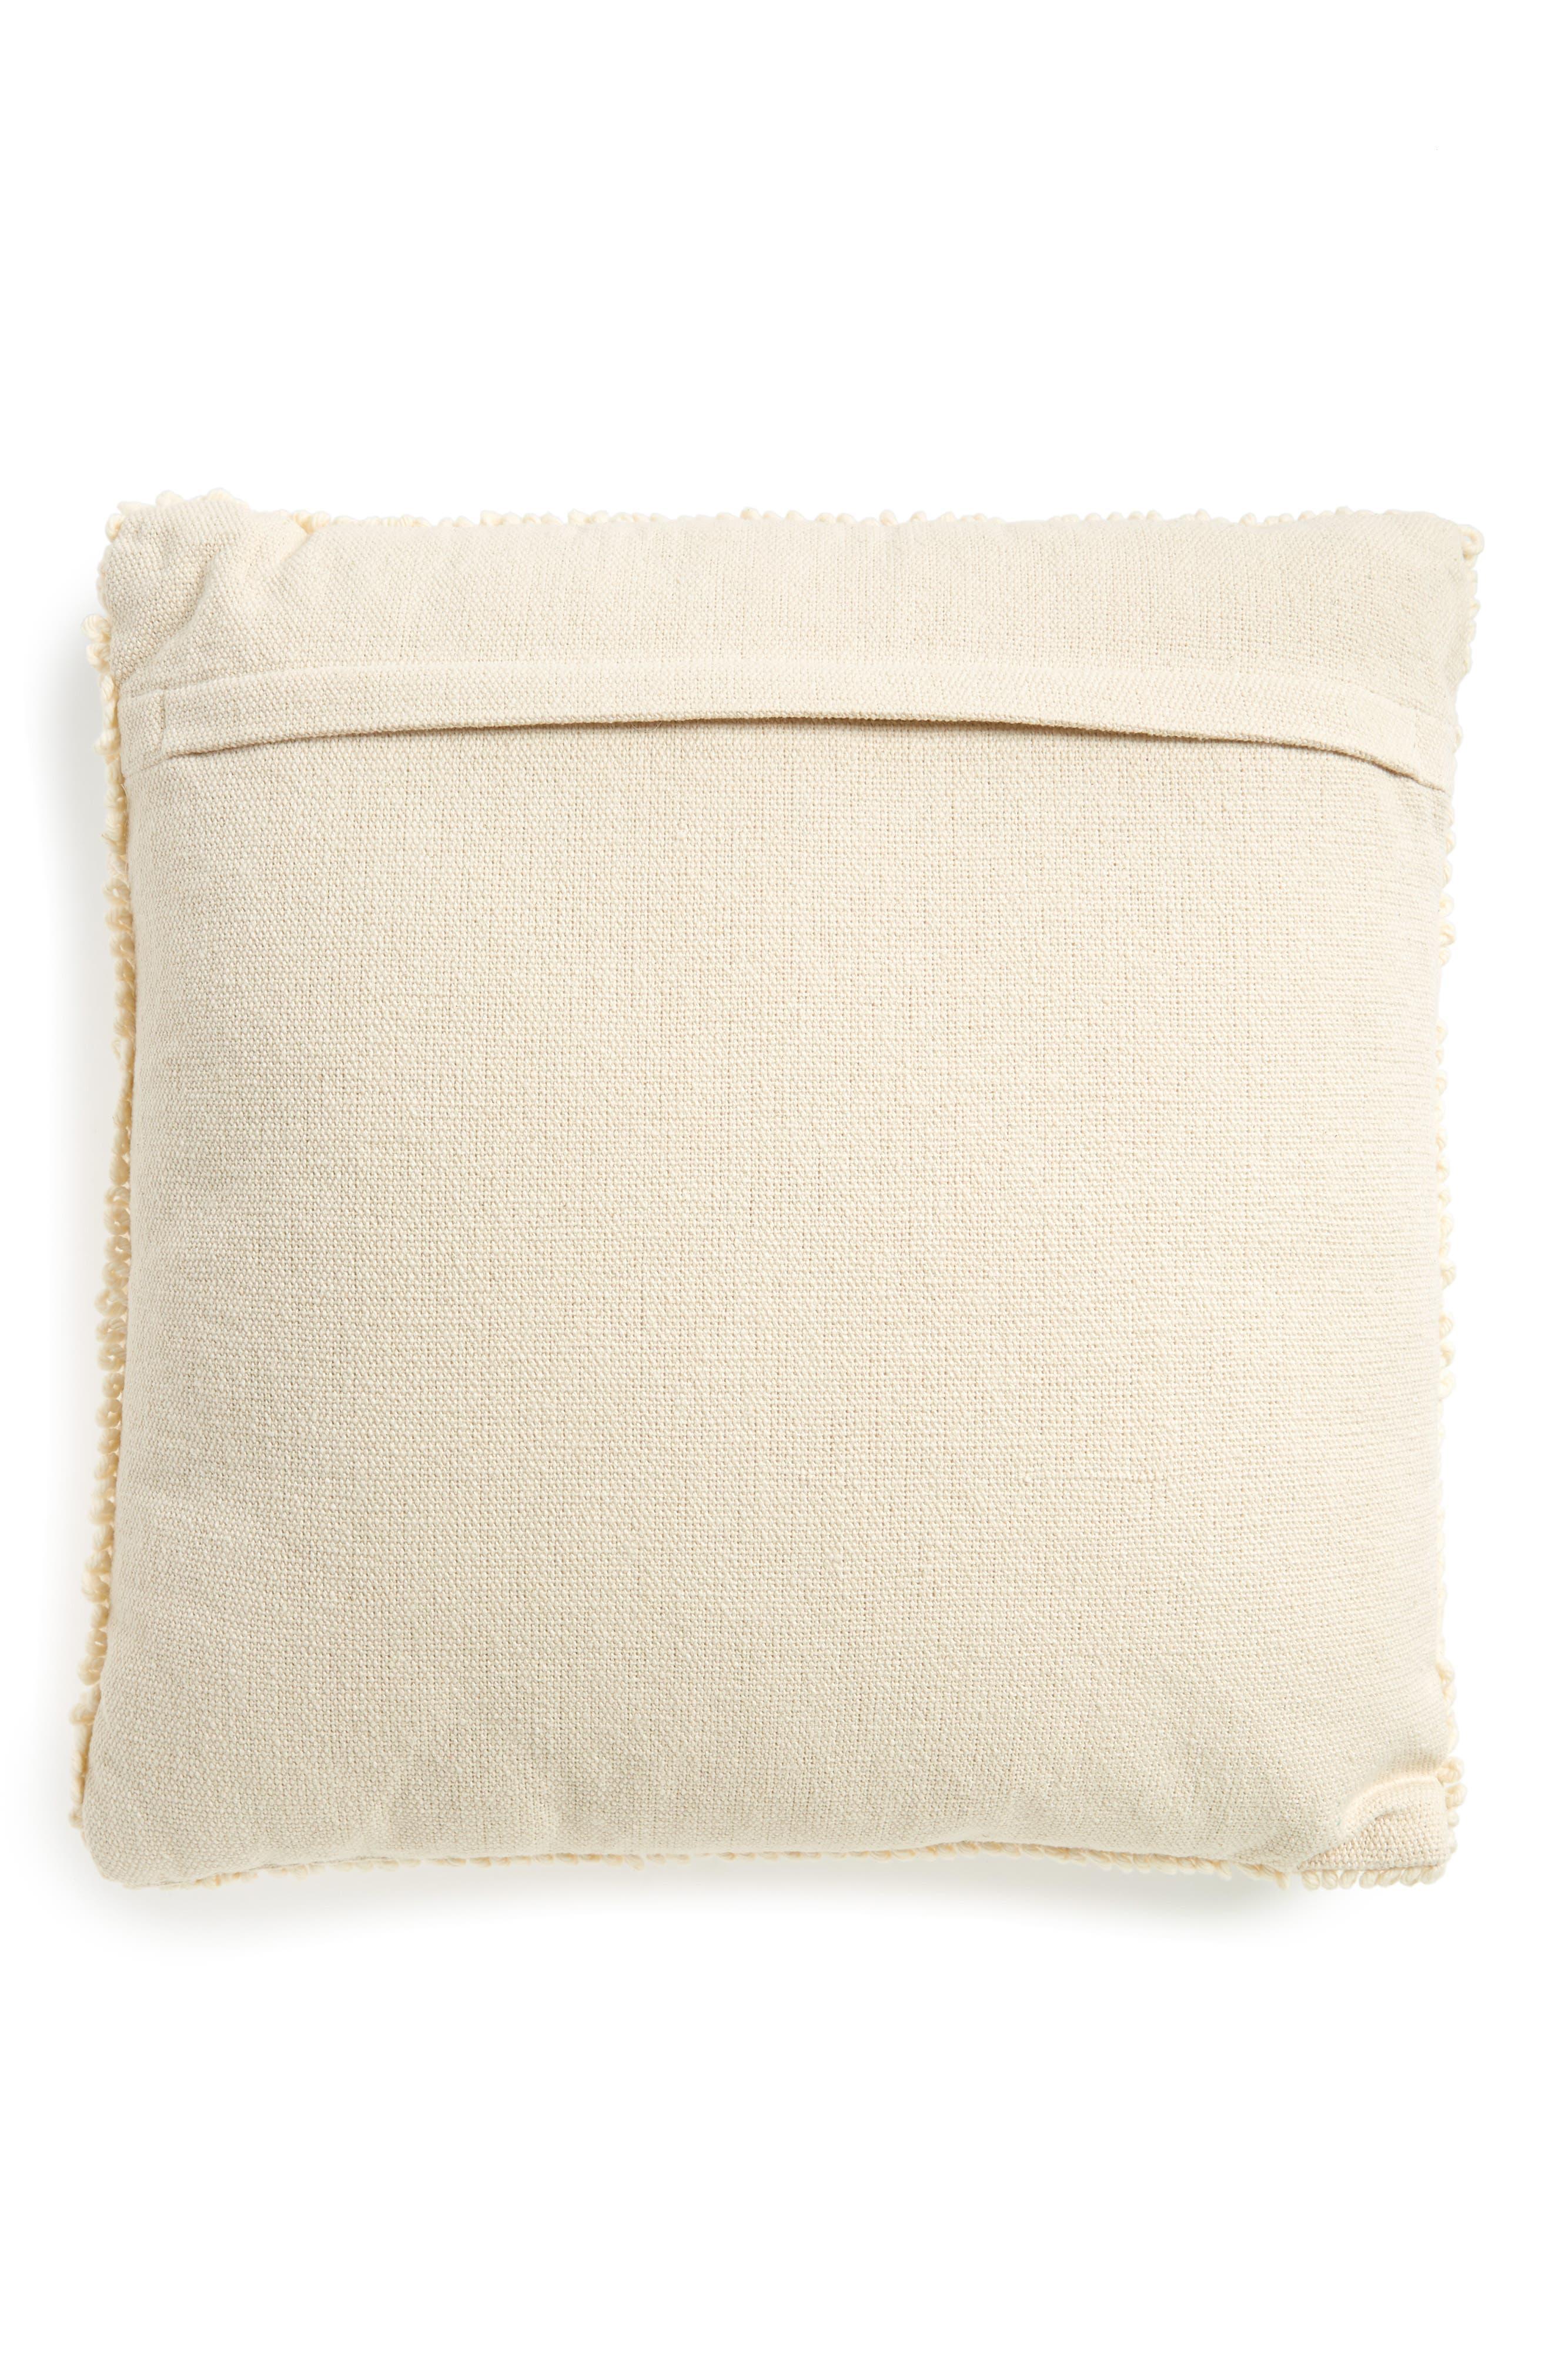 Square Accent Pillow,                             Alternate thumbnail 2, color,                             100